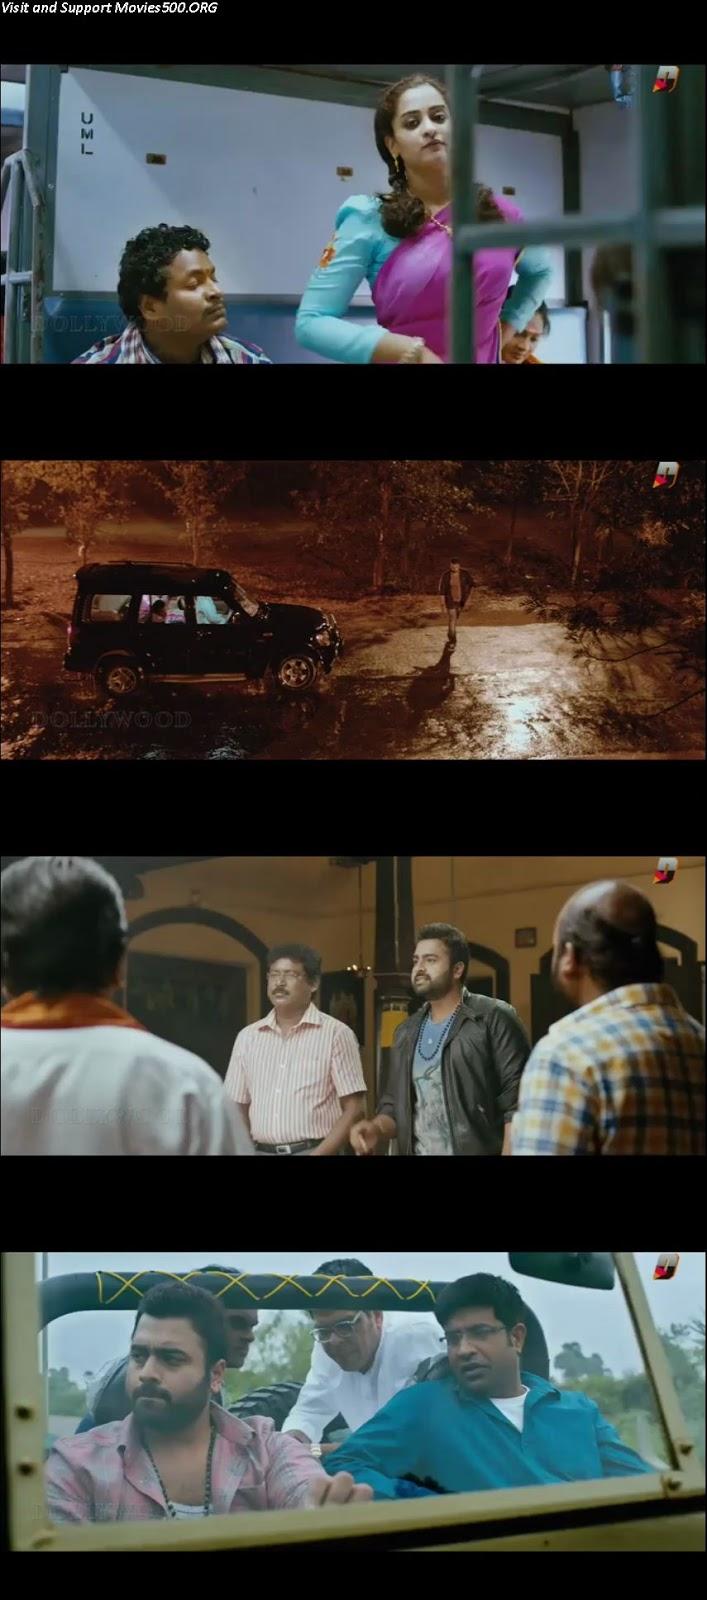 Savitri 2017 Full 300MB Movie Download HD 480p at movies500.site